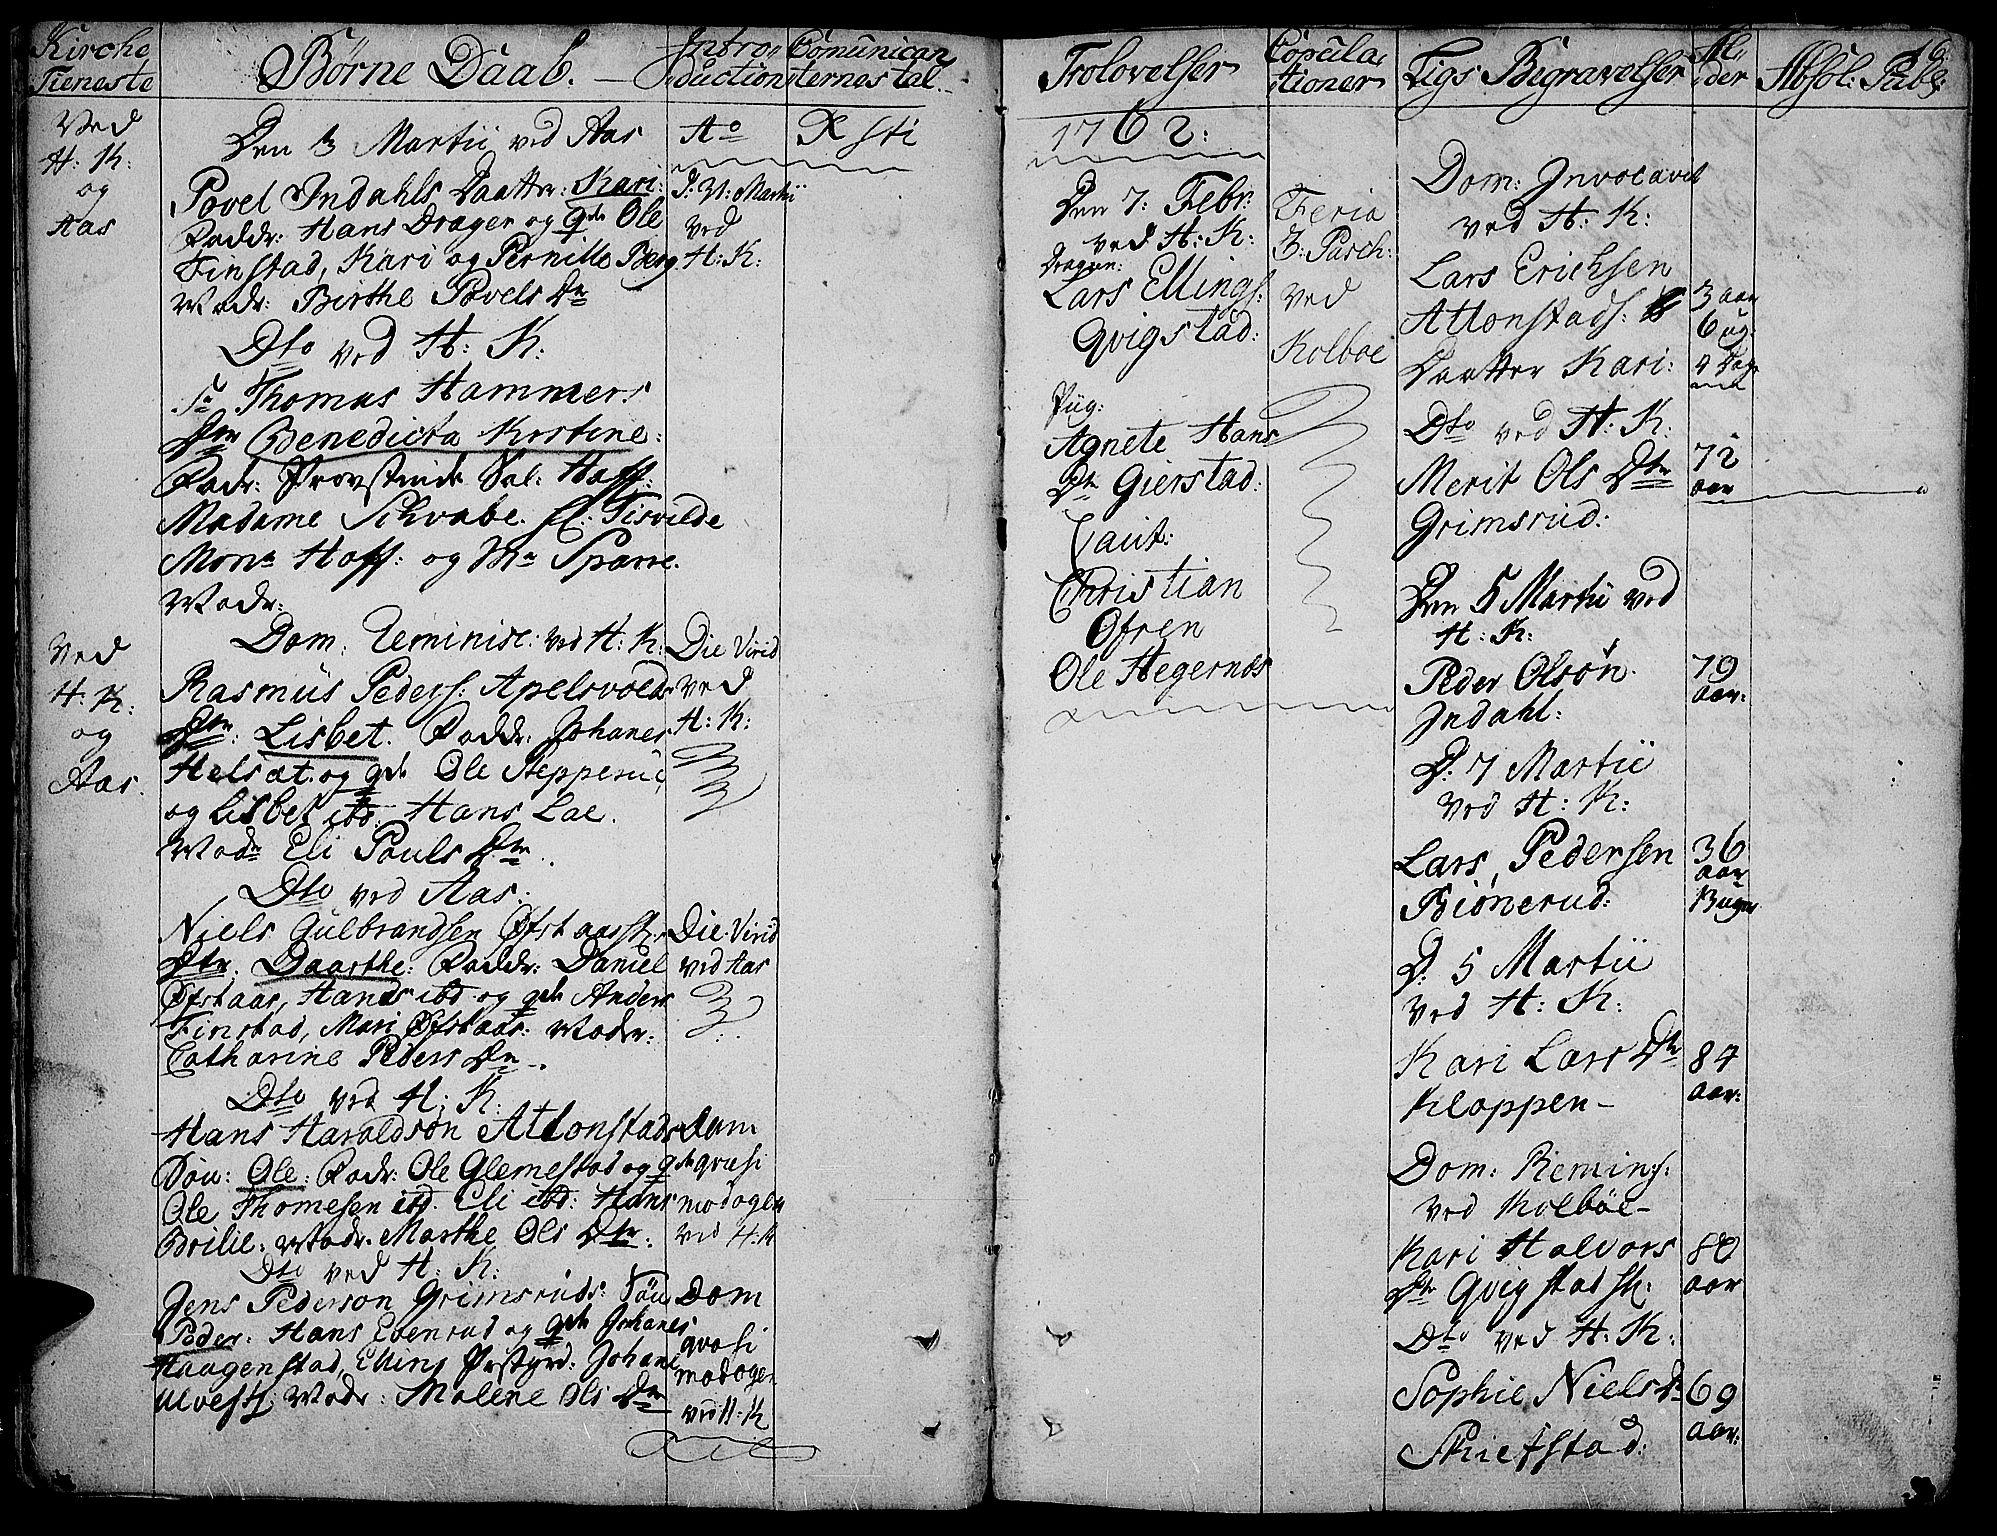 SAH, Toten prestekontor, Ministerialbok nr. 5, 1761-1772, s. 16